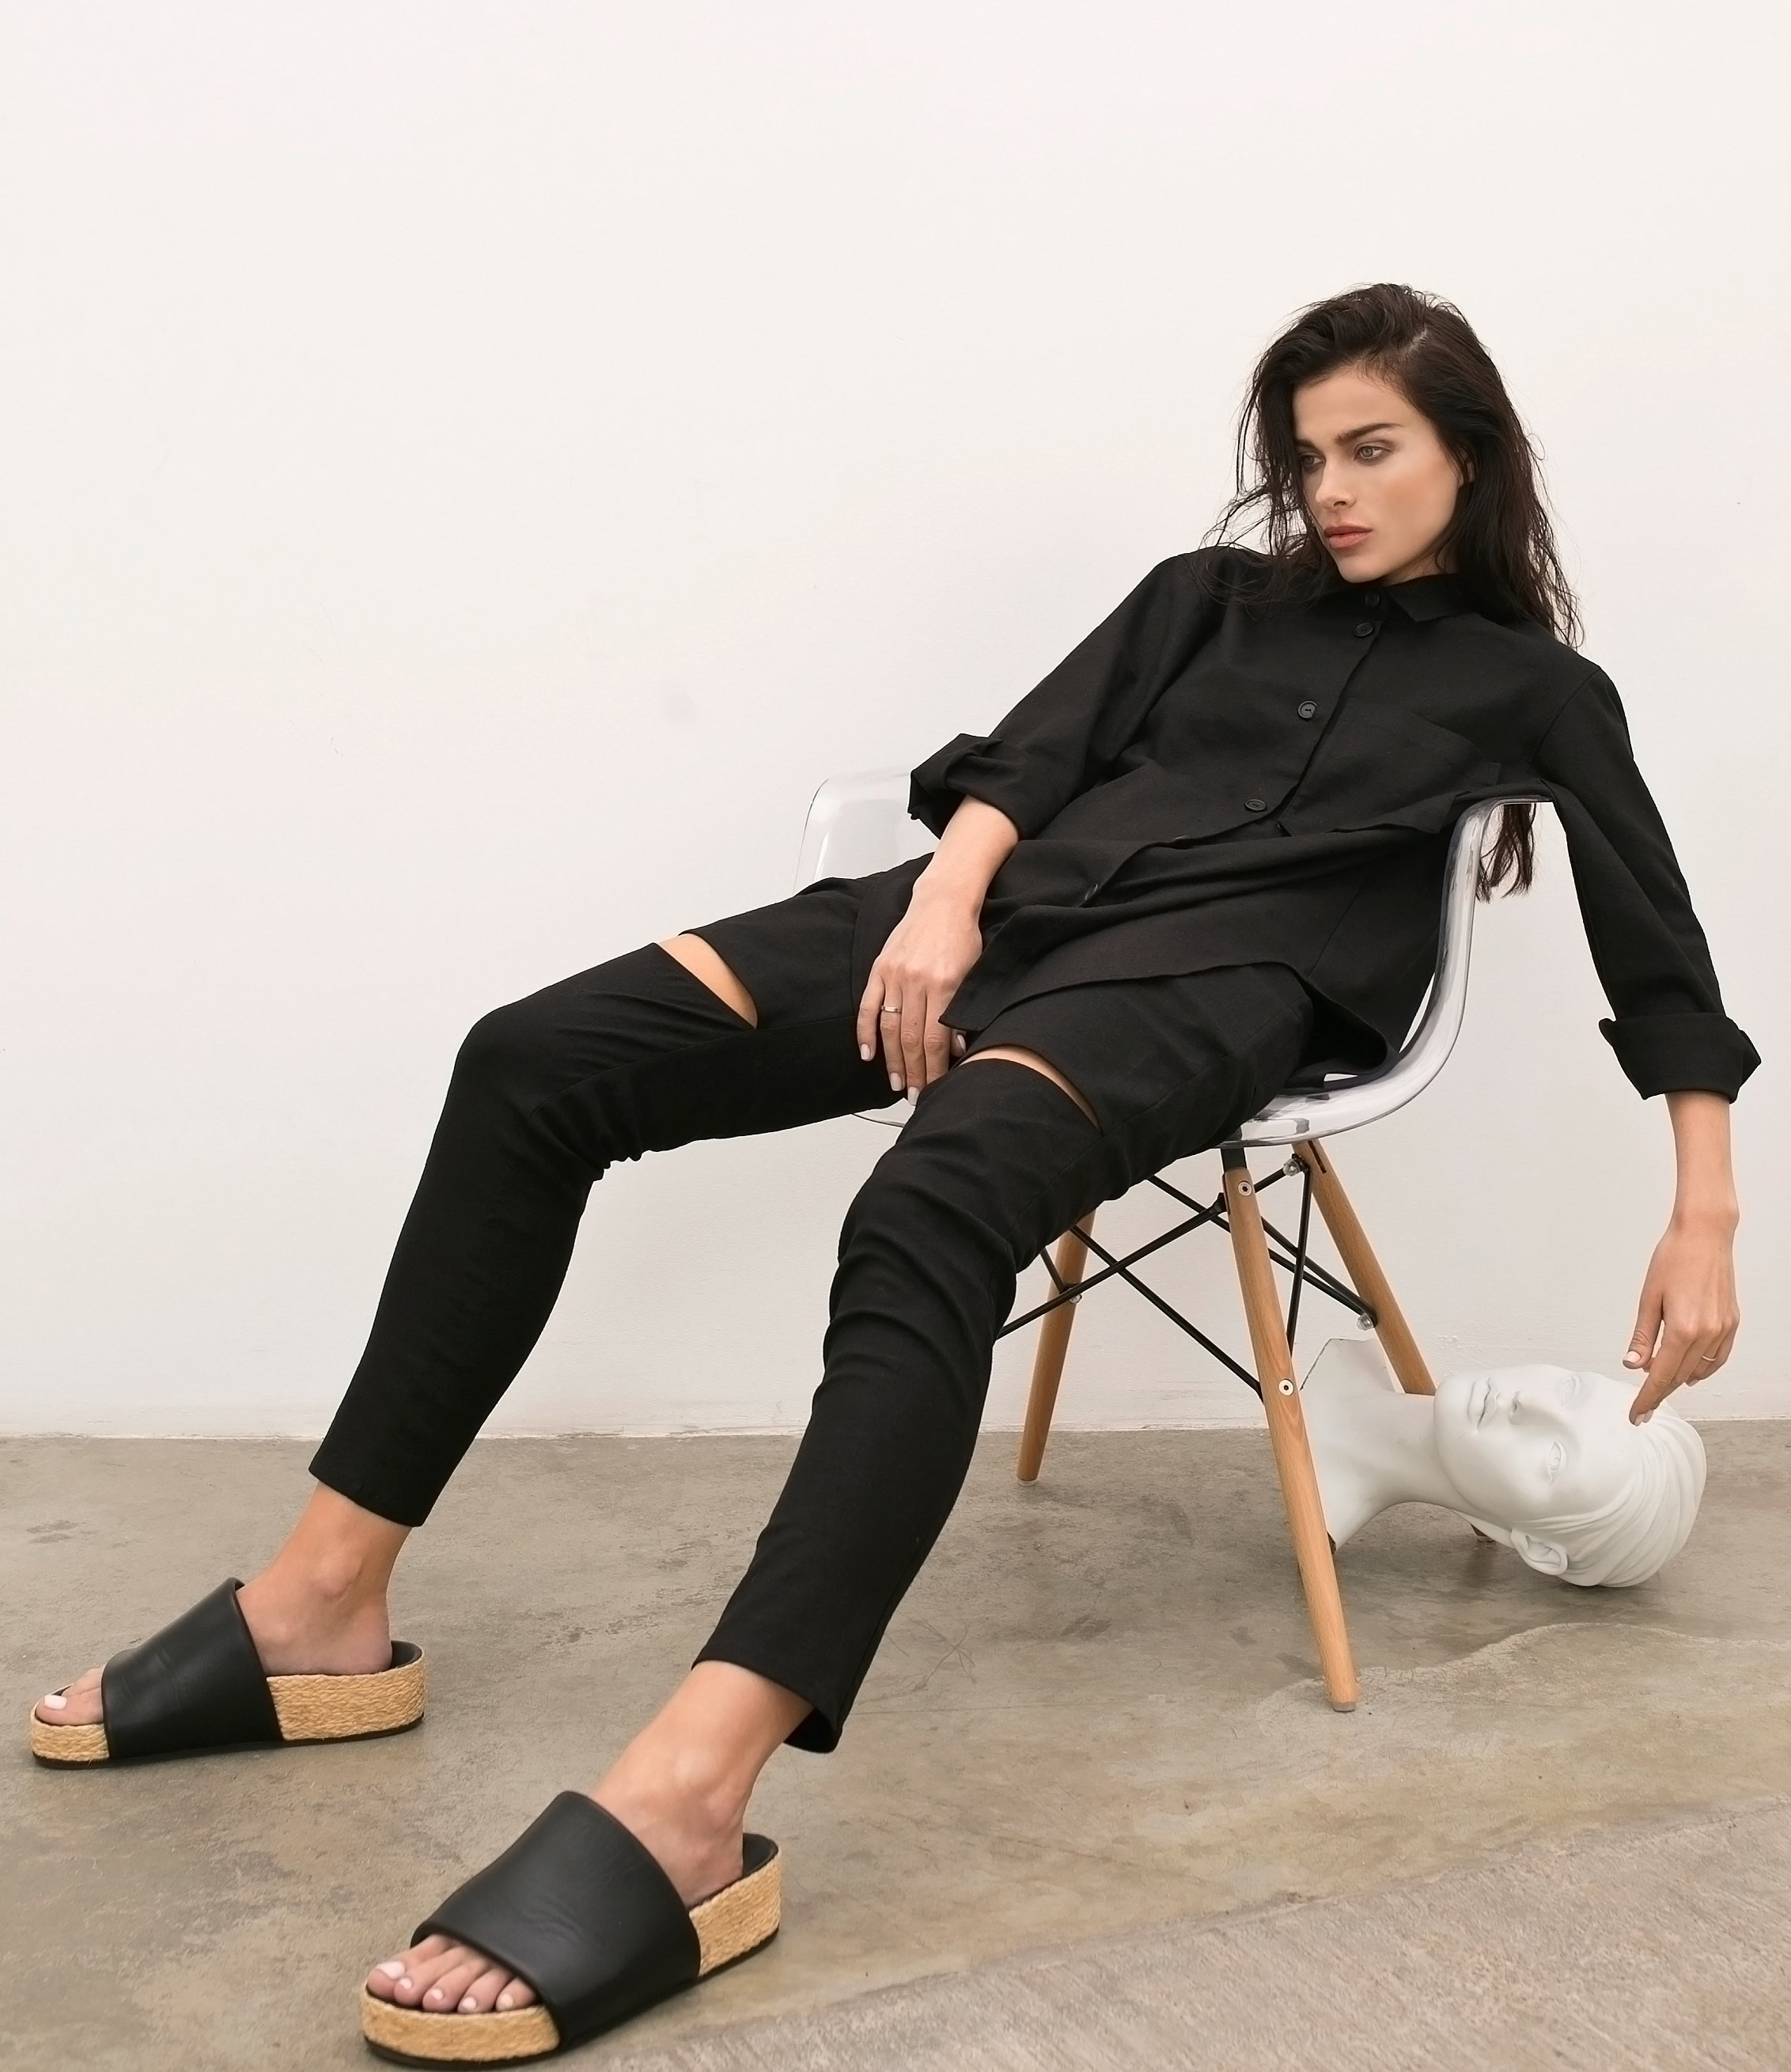 Elena Temnikova's Feet